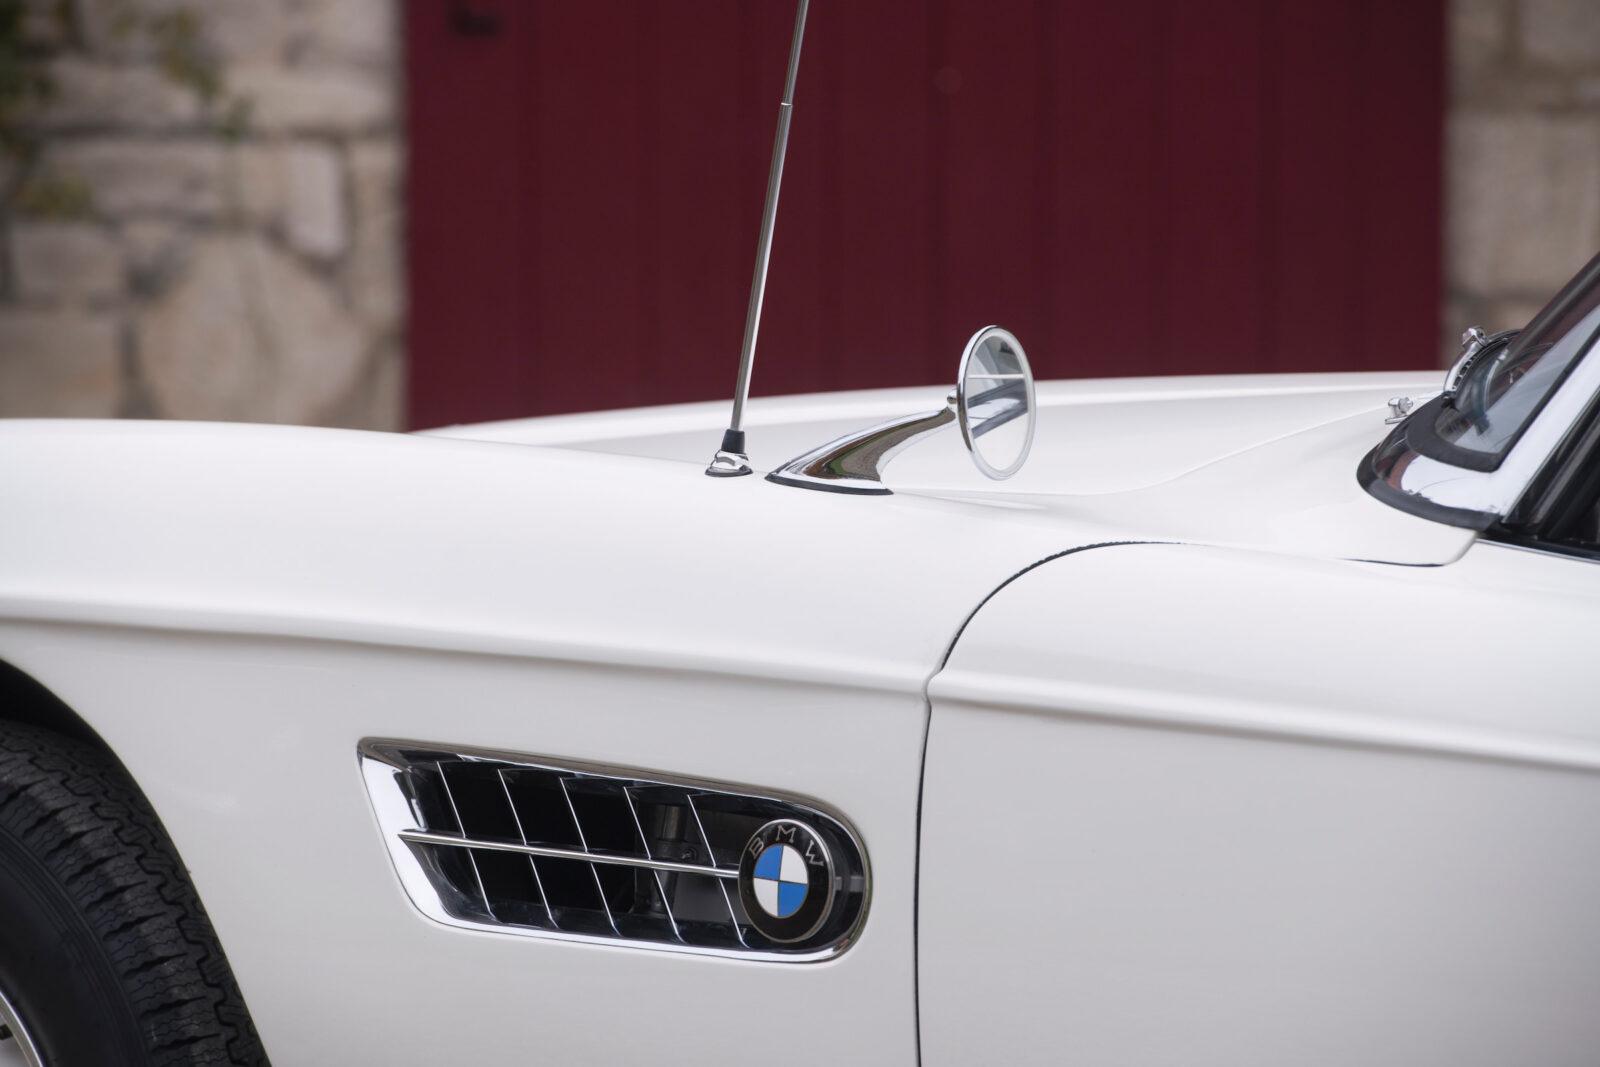 BMW 507 Roadster Vent 1600x1067 - 1958 BMW 507 Roadster Series II